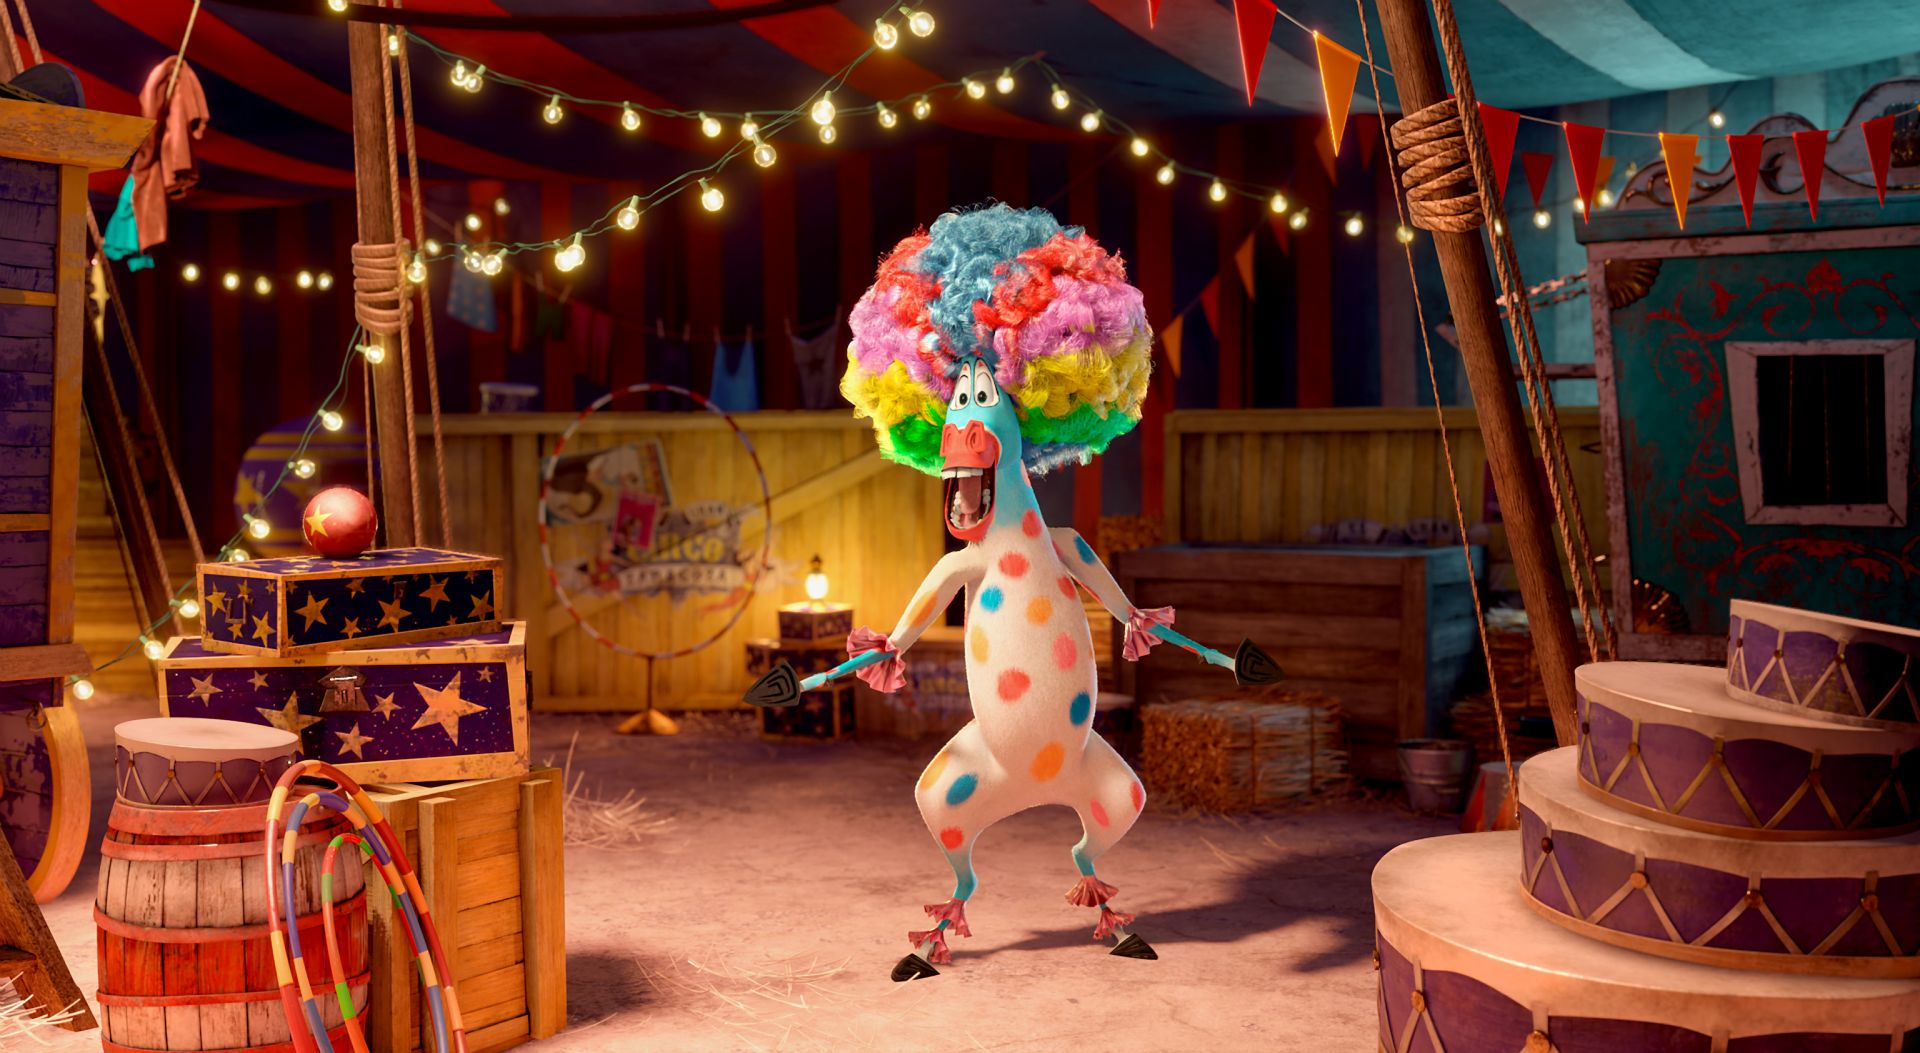 madagascar 3 afro circus ending relationship